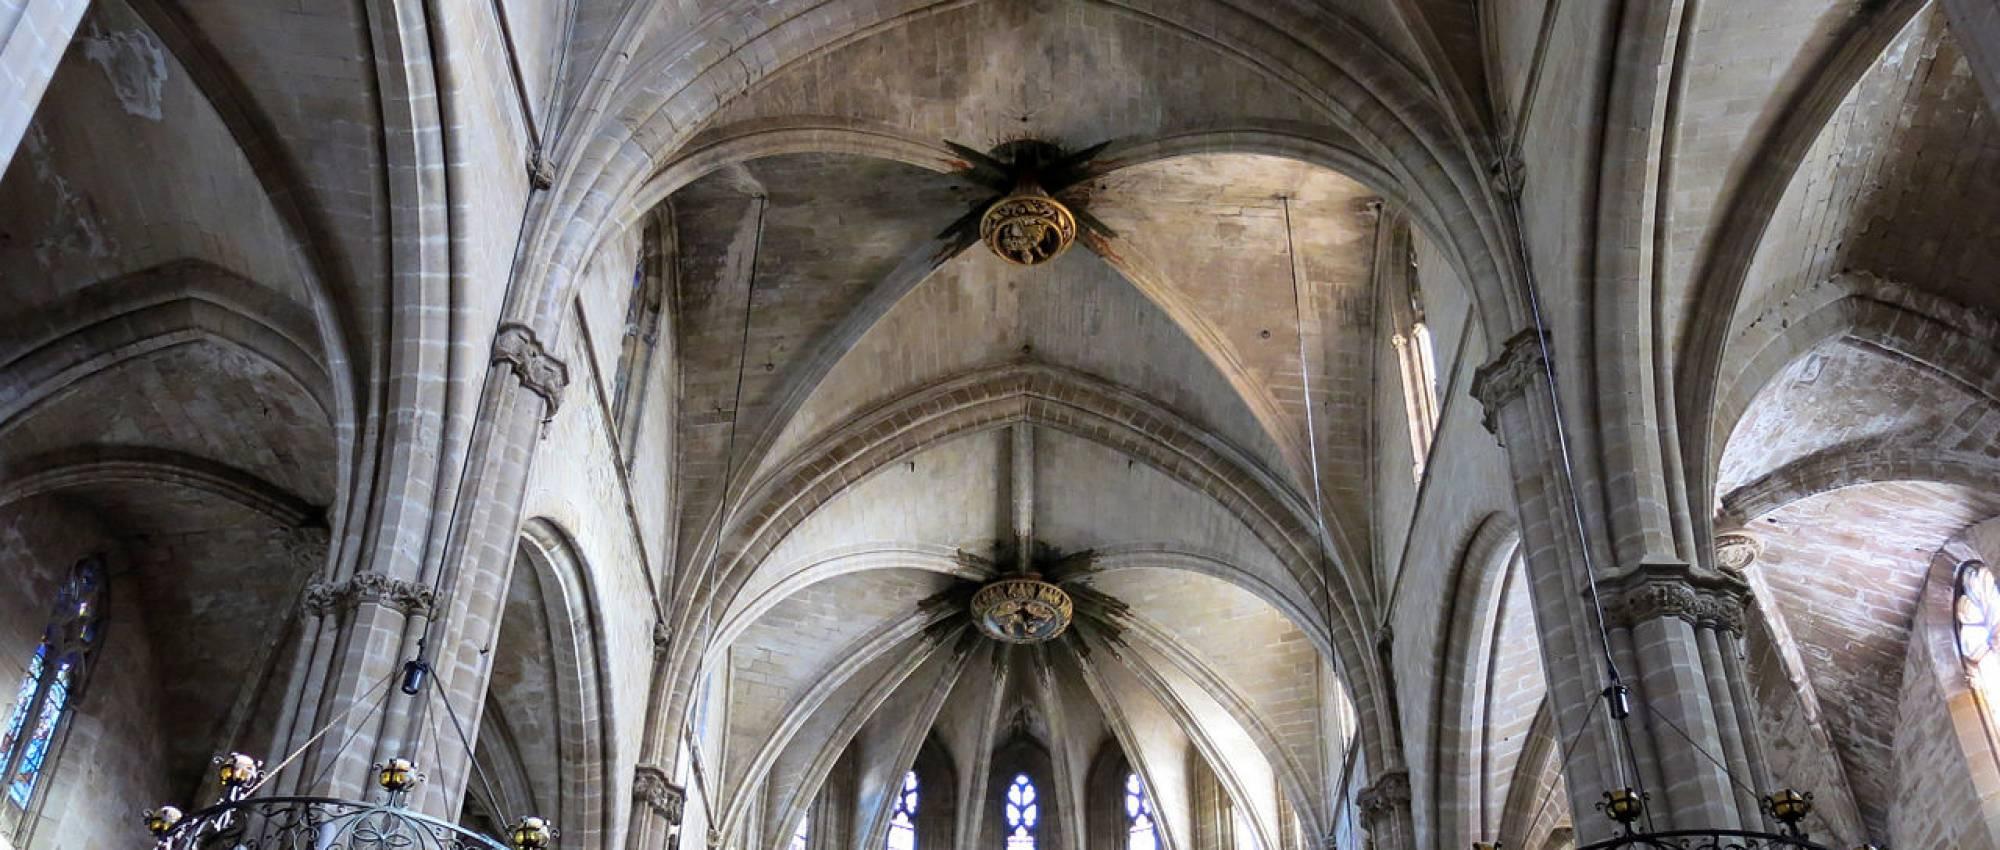 Nau central de la catedral de Sta. Maria de Tortosa. Enric / Wikimedia Commons. CC BY-SA 3.0